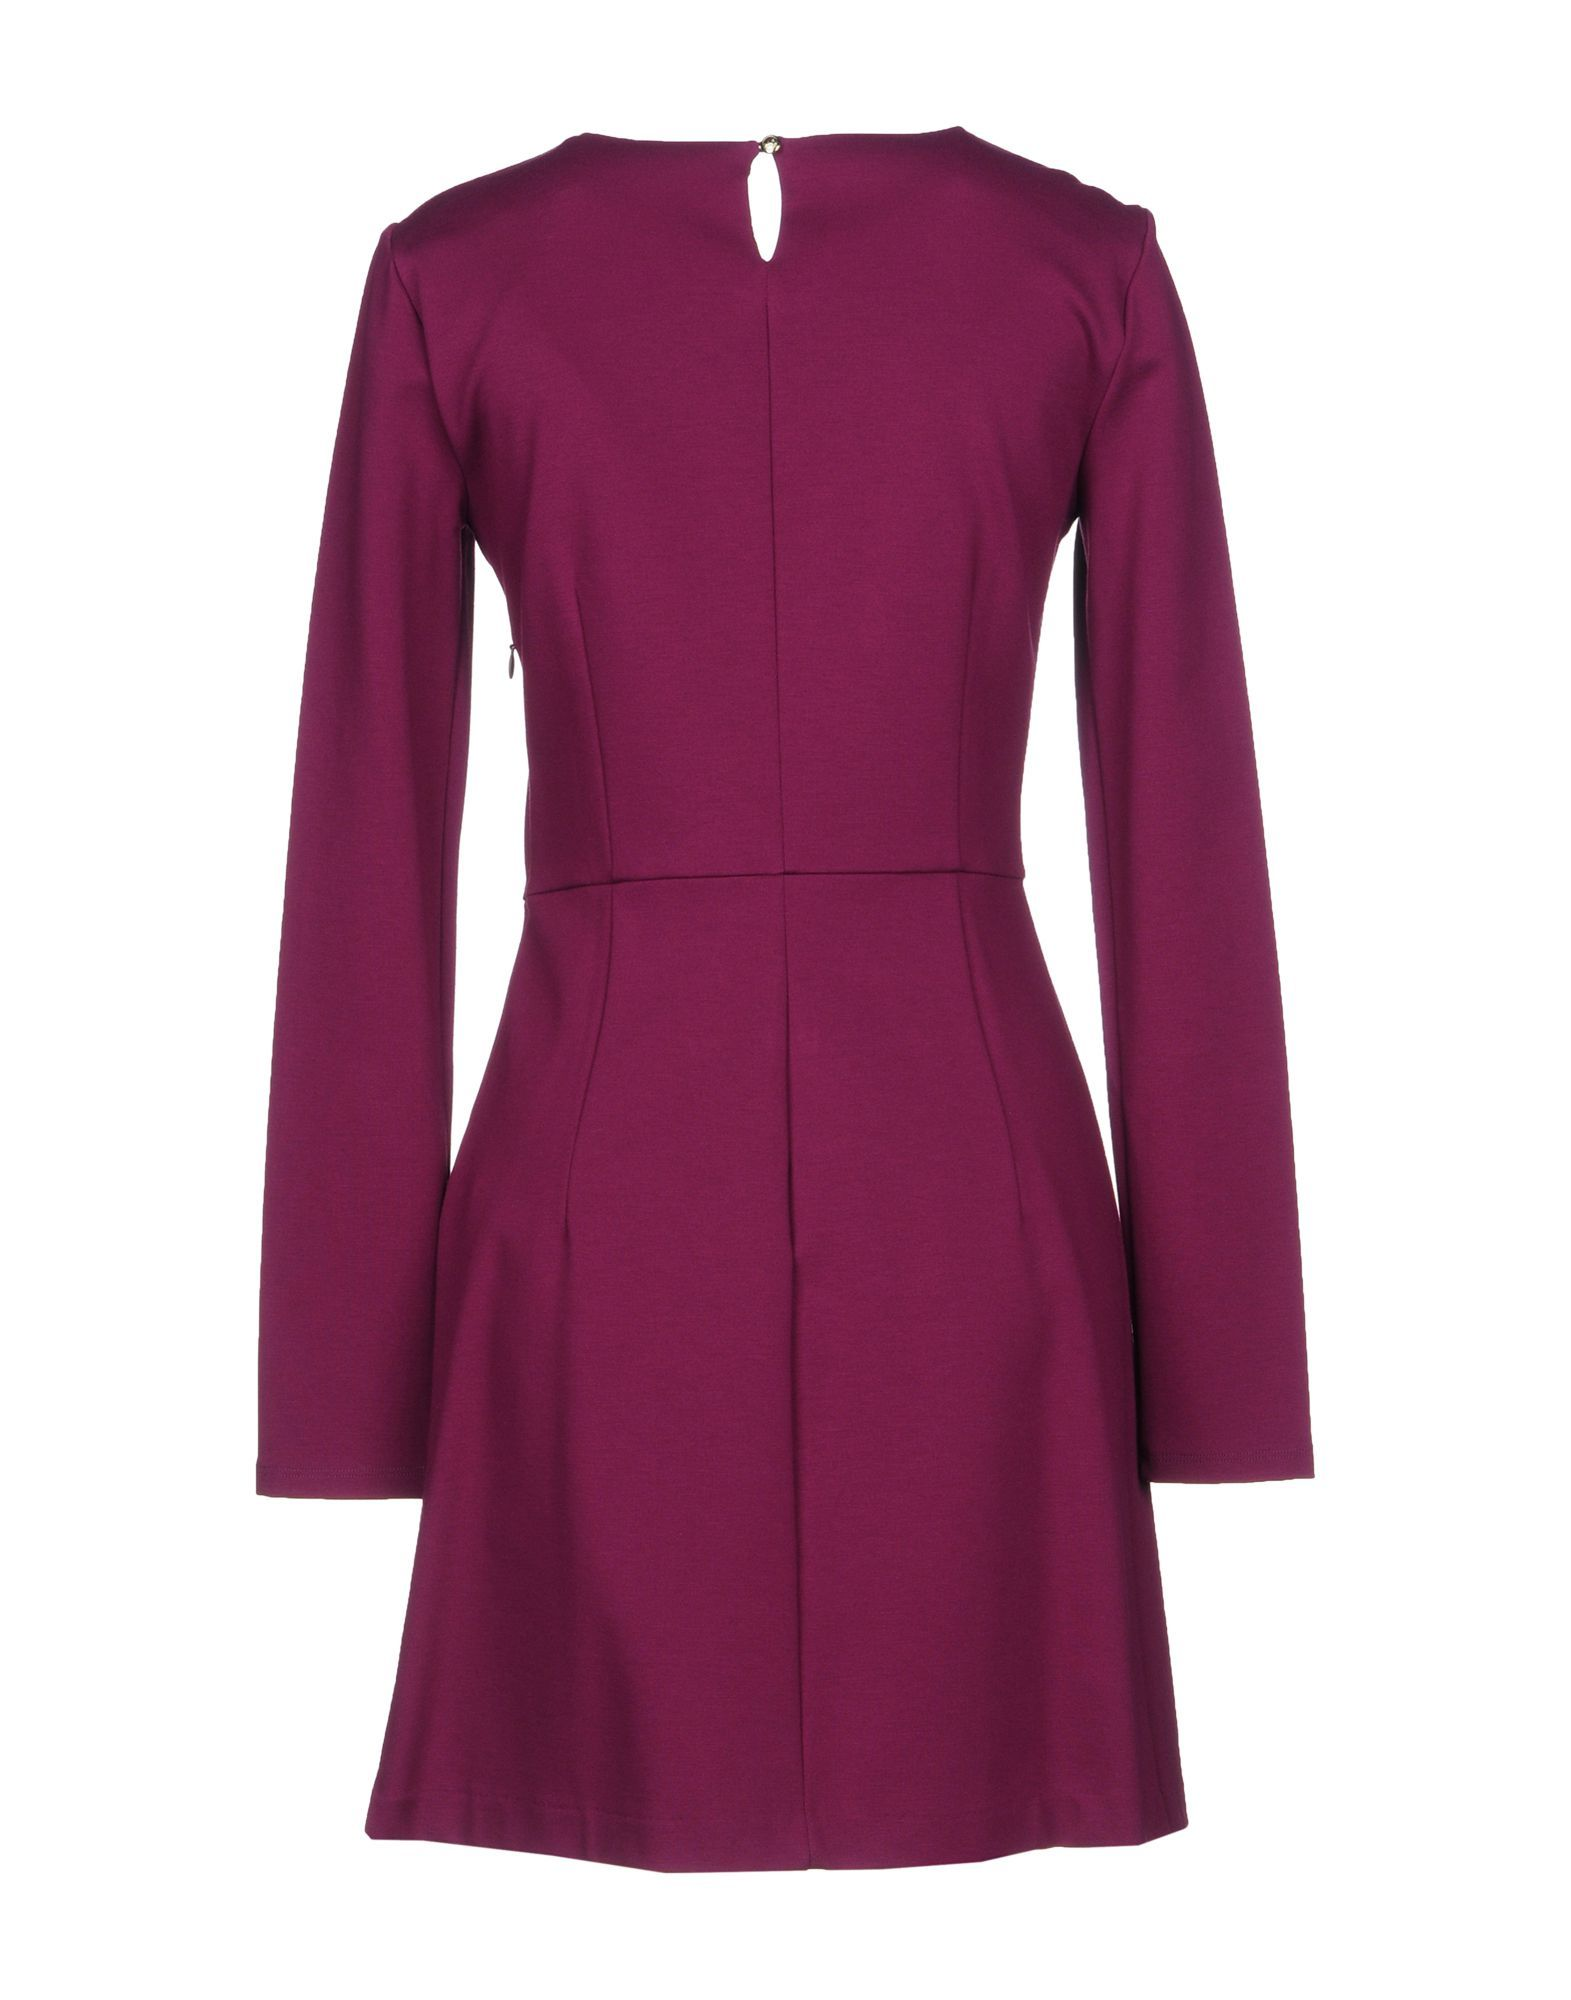 Patrizia Pepe Garnet Long Sleeve Dress